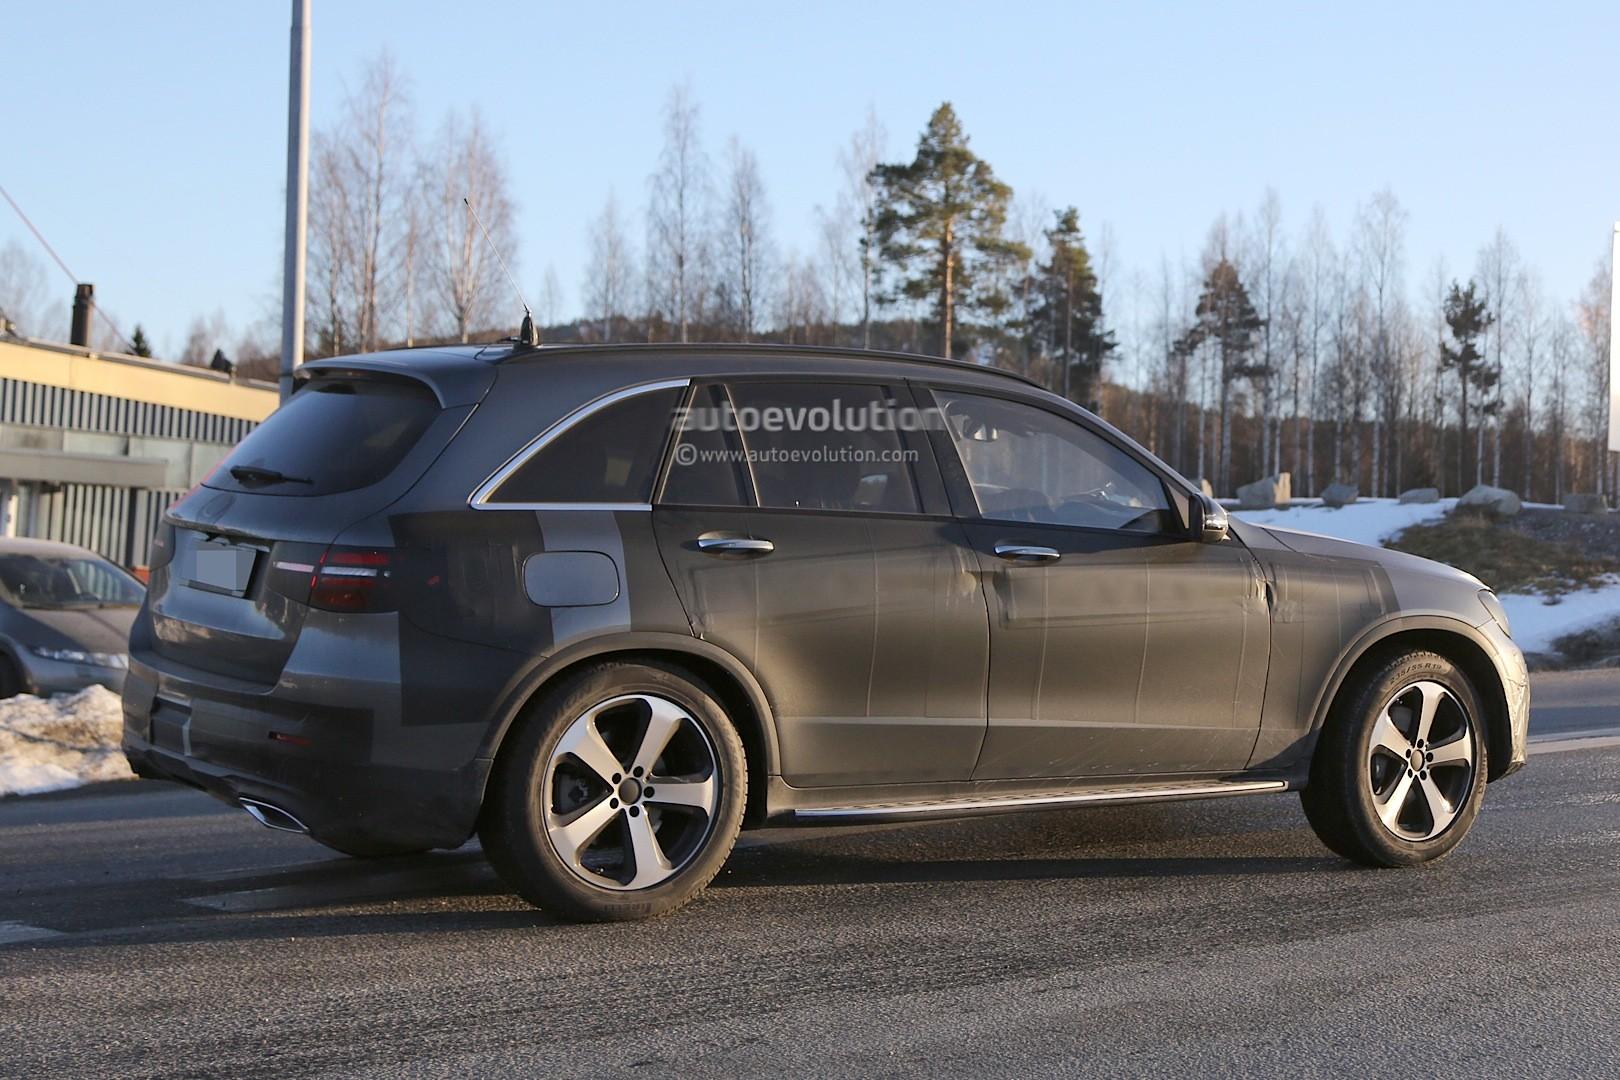 2015 - [Mercedes] GLC (GLK II) [X205] - Page 10 2016-mercedes-glc-spy-photos-show-nearly-undisguised-pre-production-prototypes_25